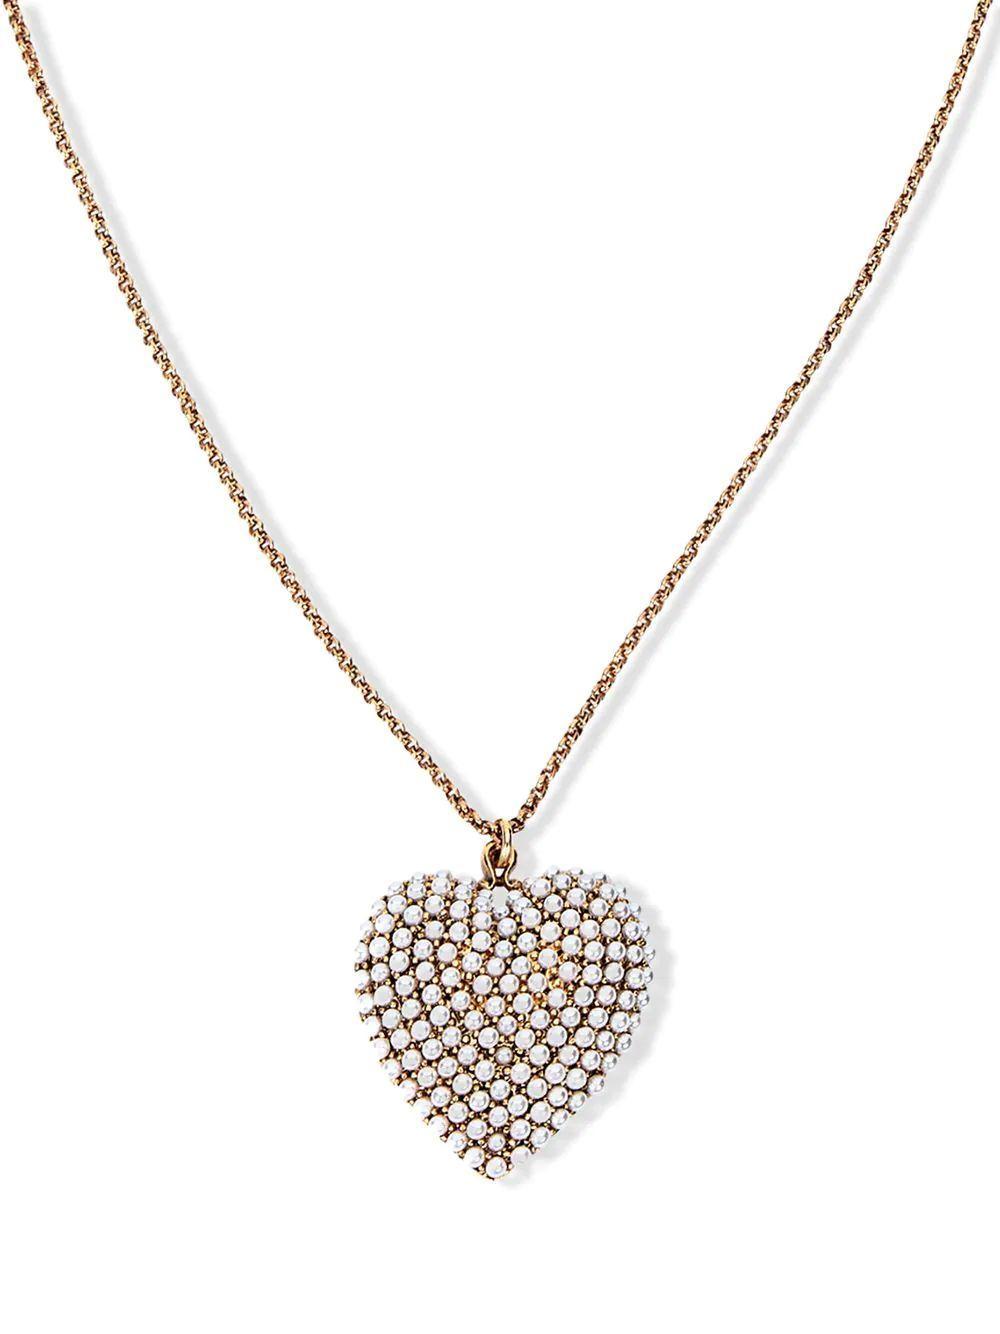 Greta Heart Pendant Necklace